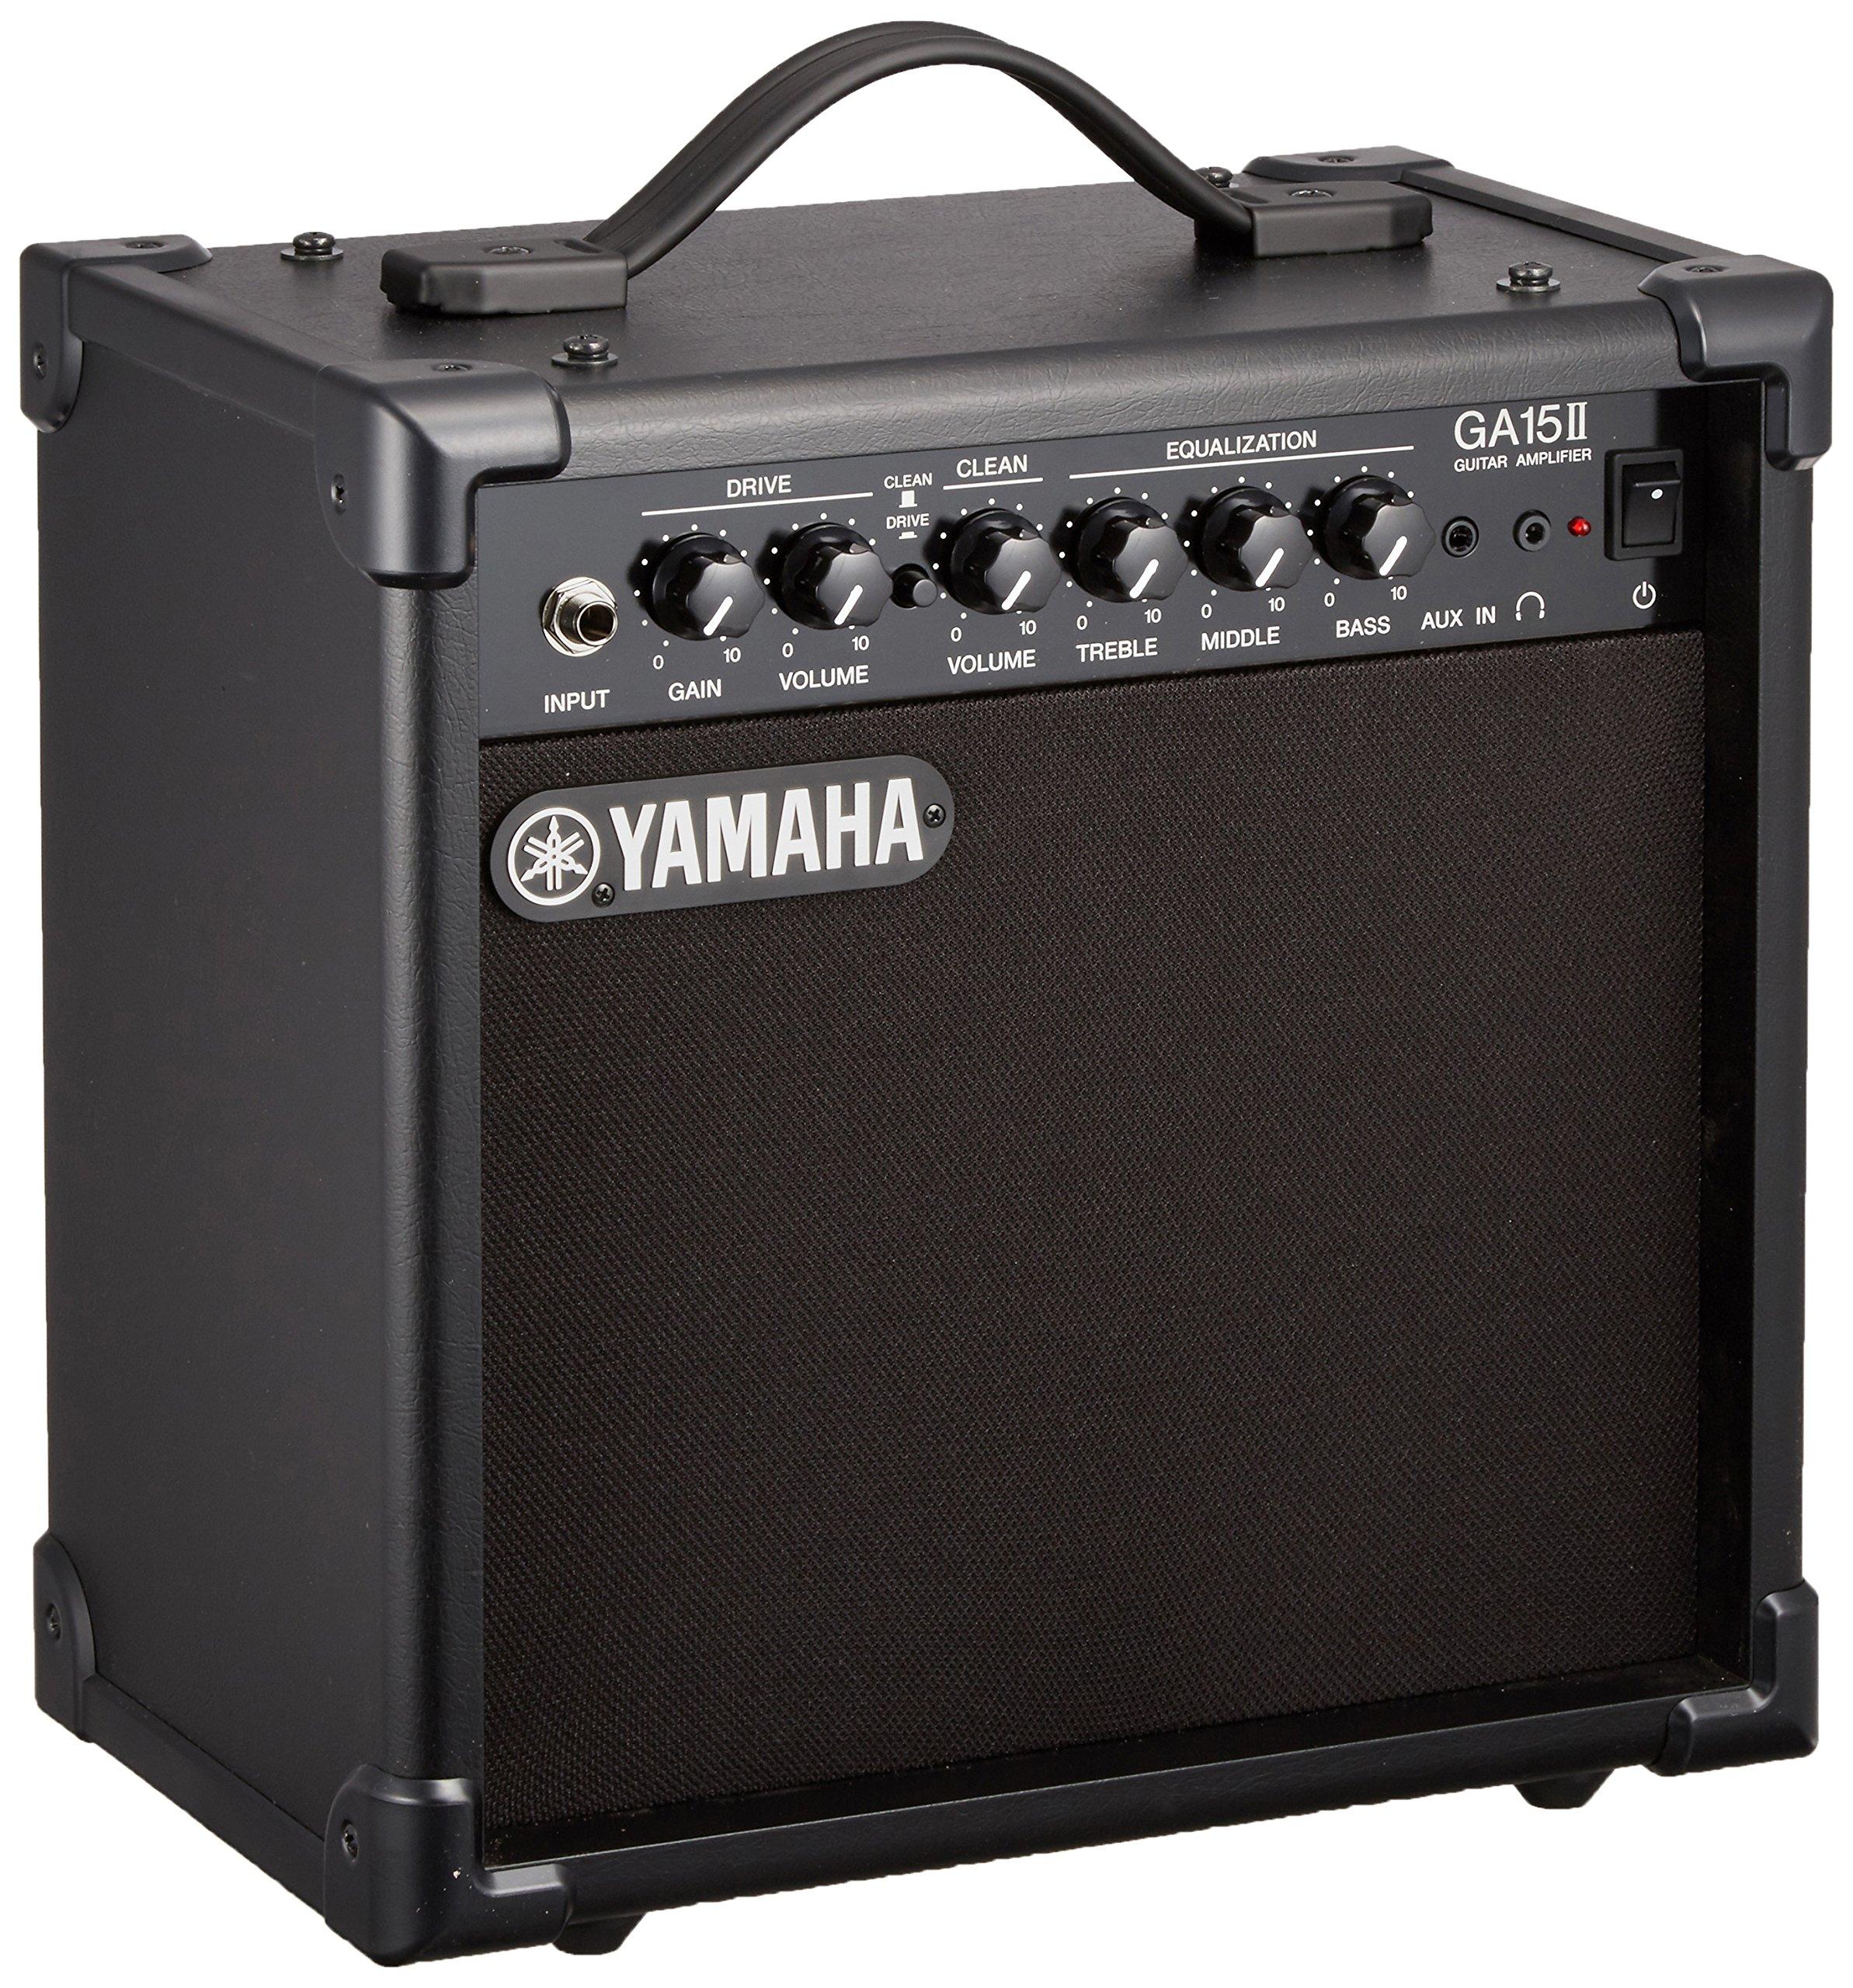 YAMAHA guitar amplifier GA15II